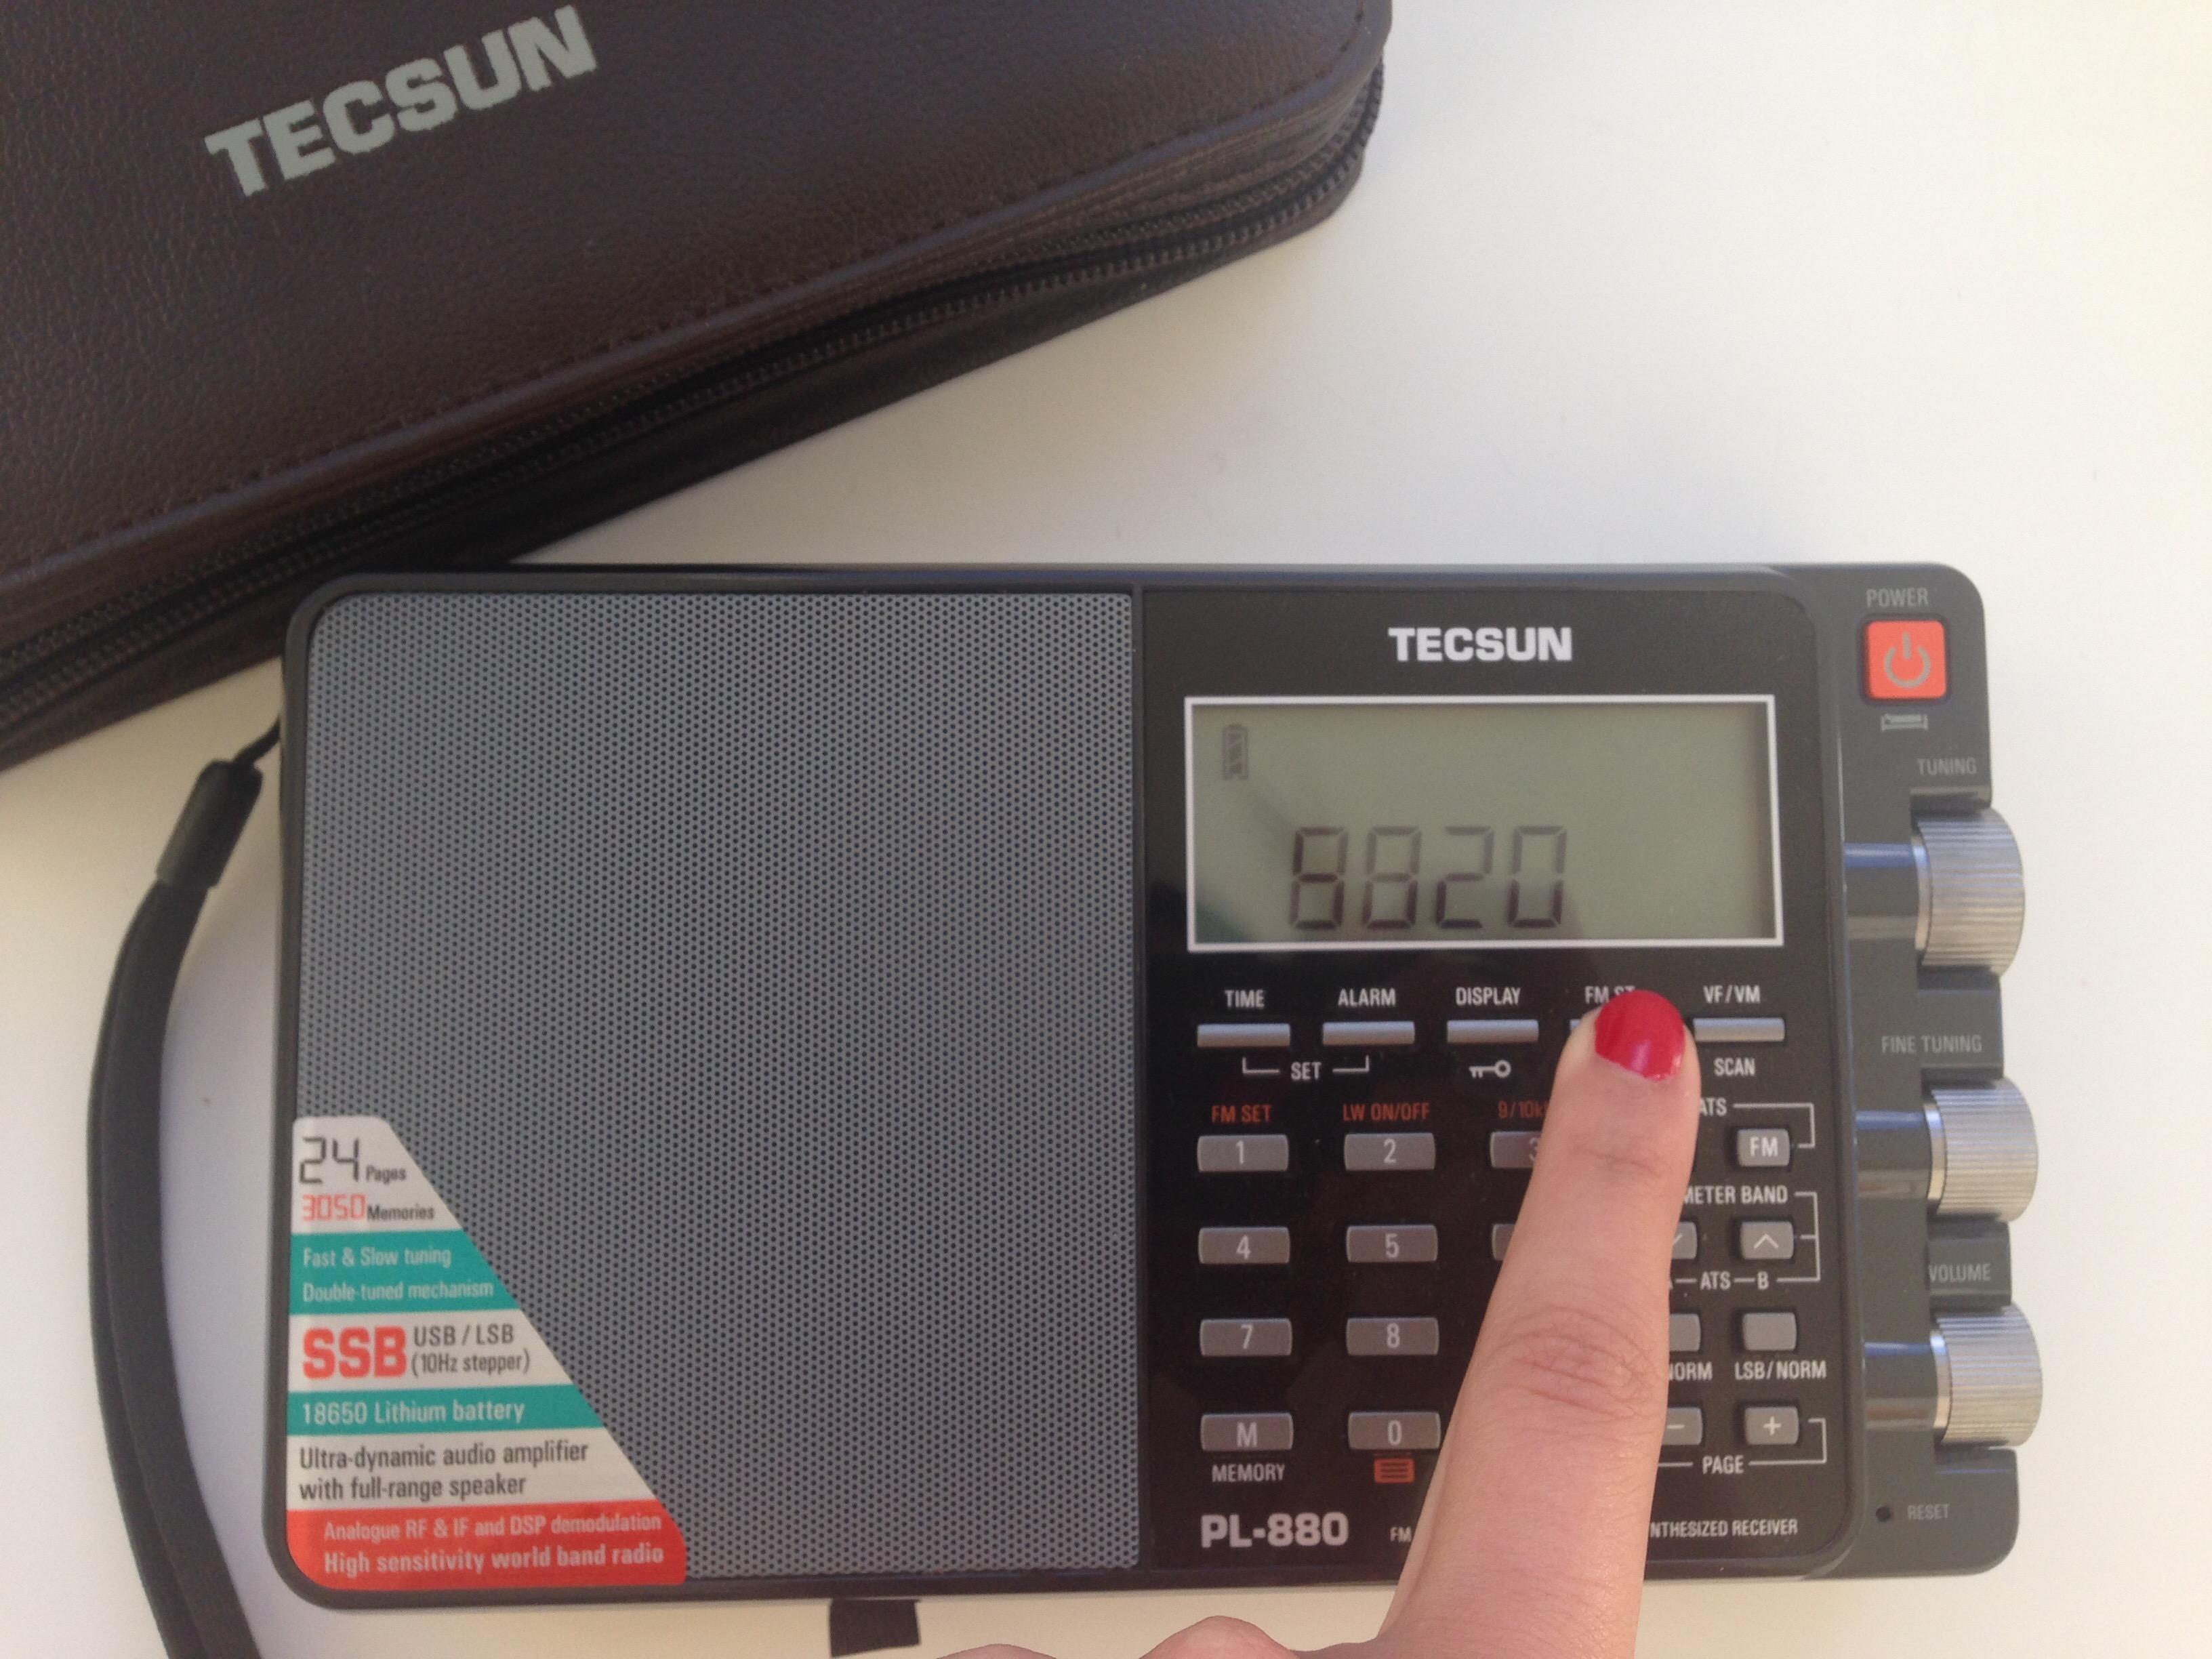 tecsun pl880 radio firmware 2